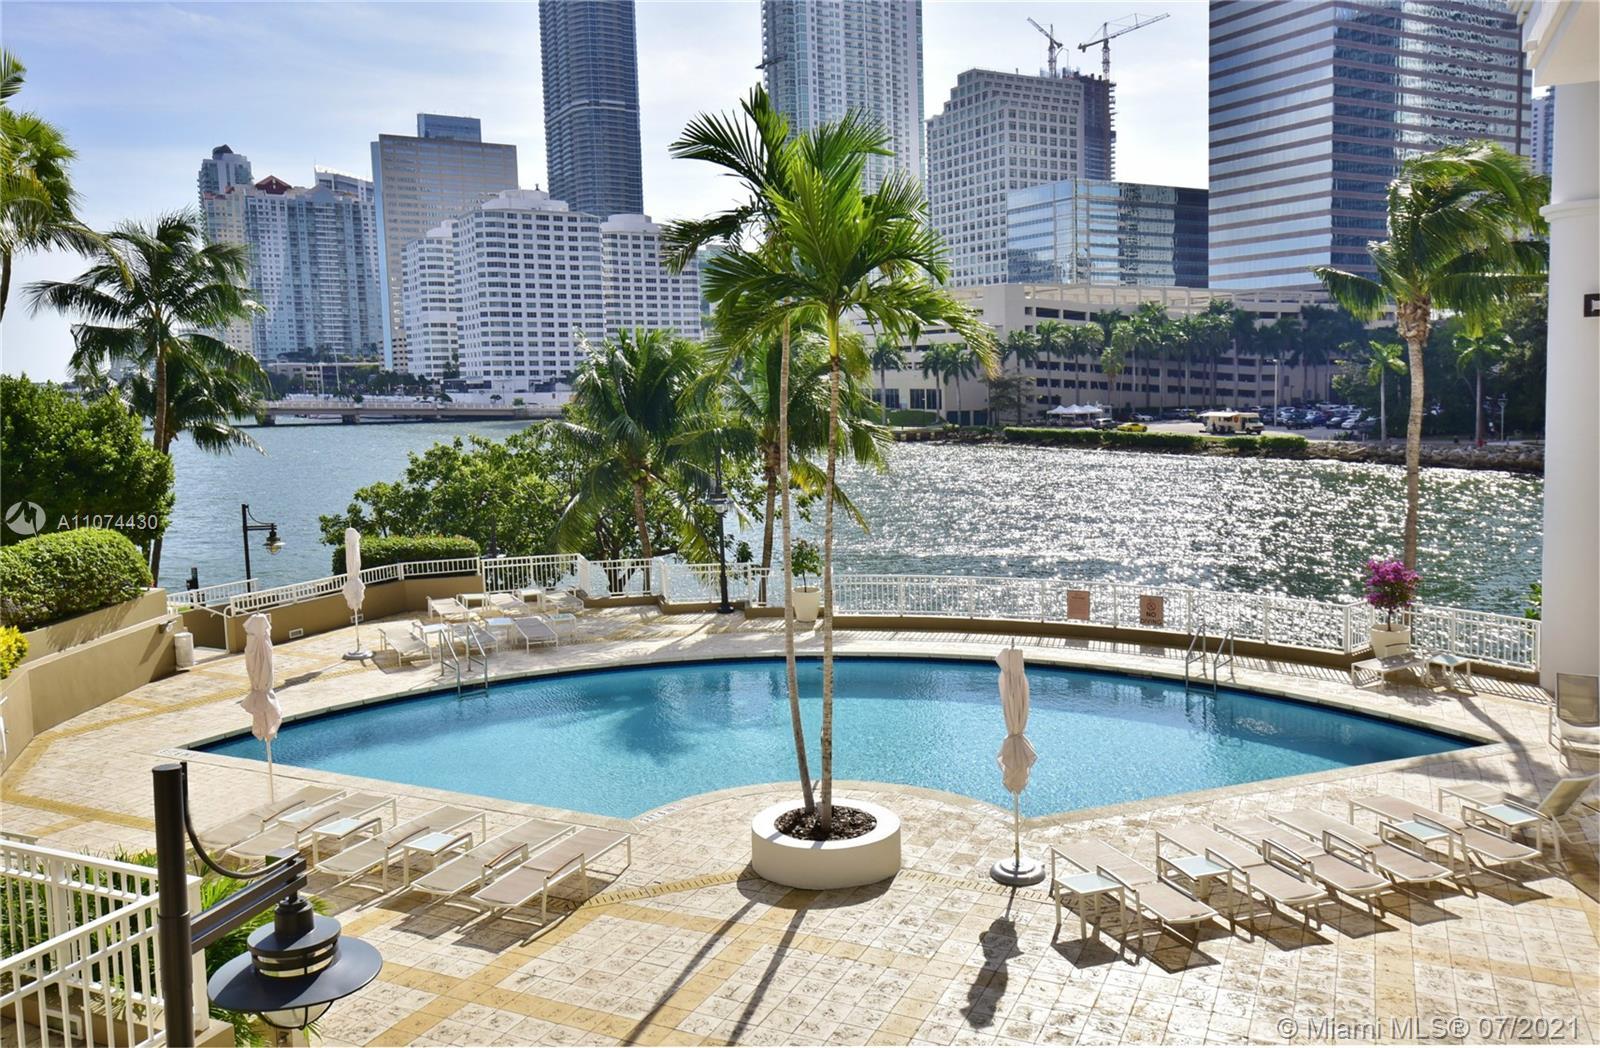 Courts Brickell Key #1810 - 801 Brickell Key Blvd #1810, Miami, FL 33131